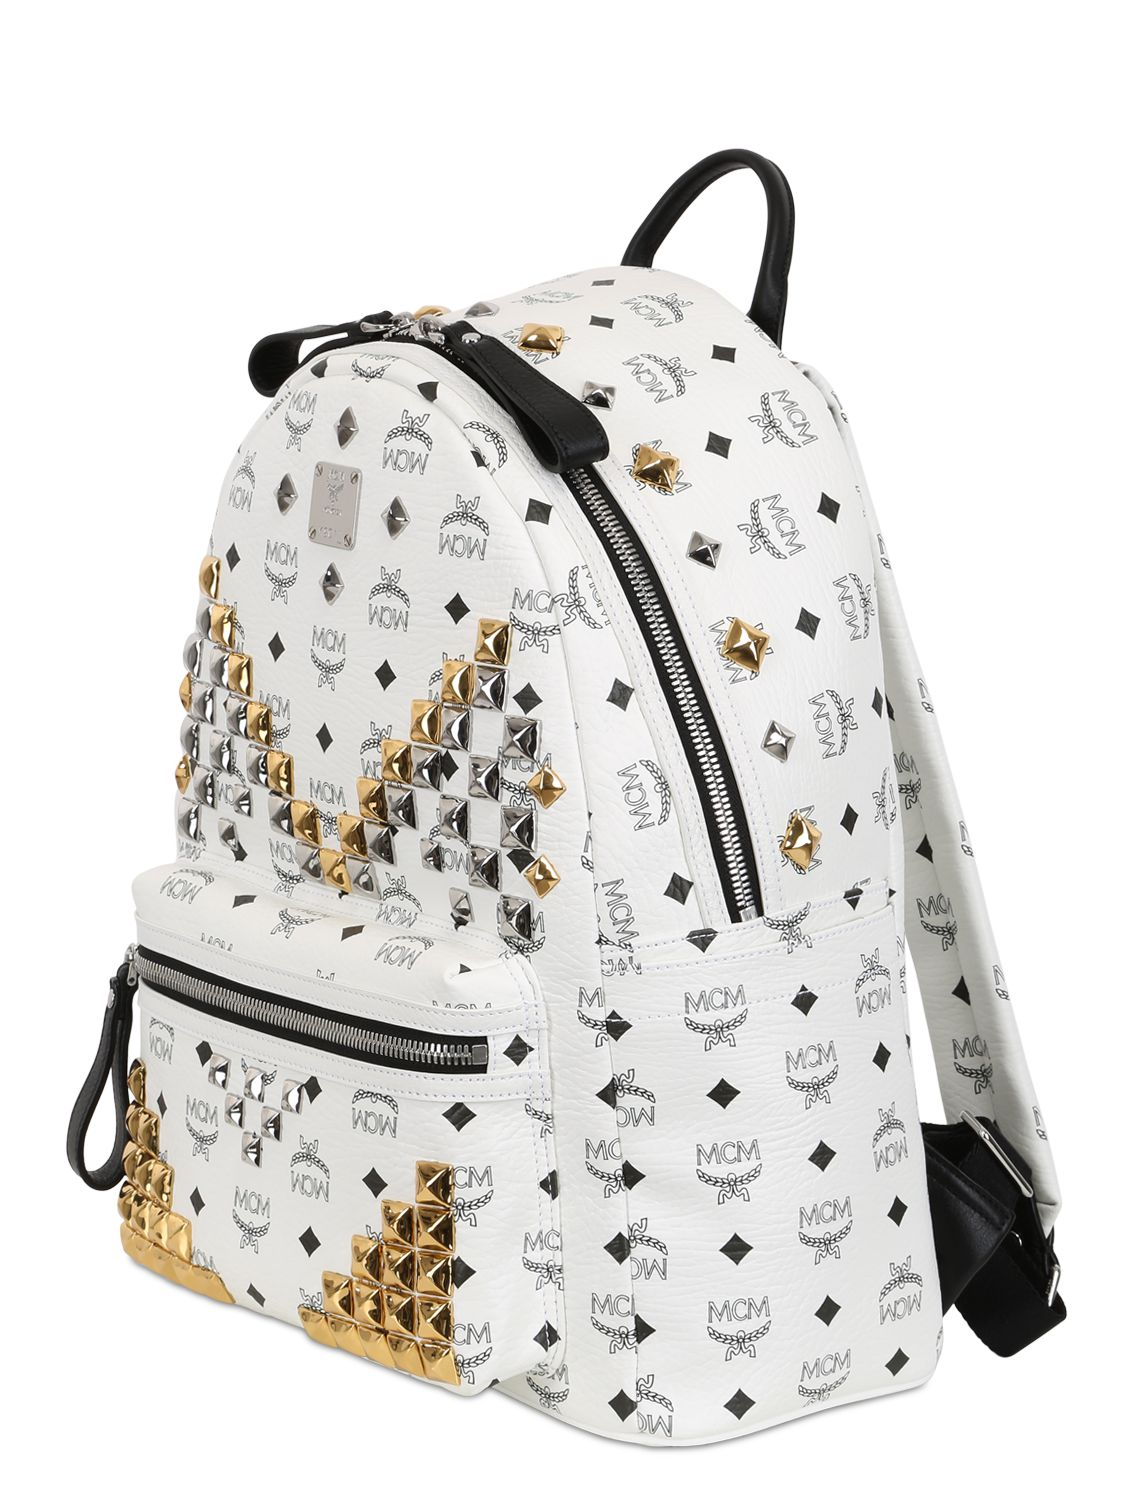 0be6a63ed15 Mcm Stark Mini Backpack White- Fenix Toulouse Handball